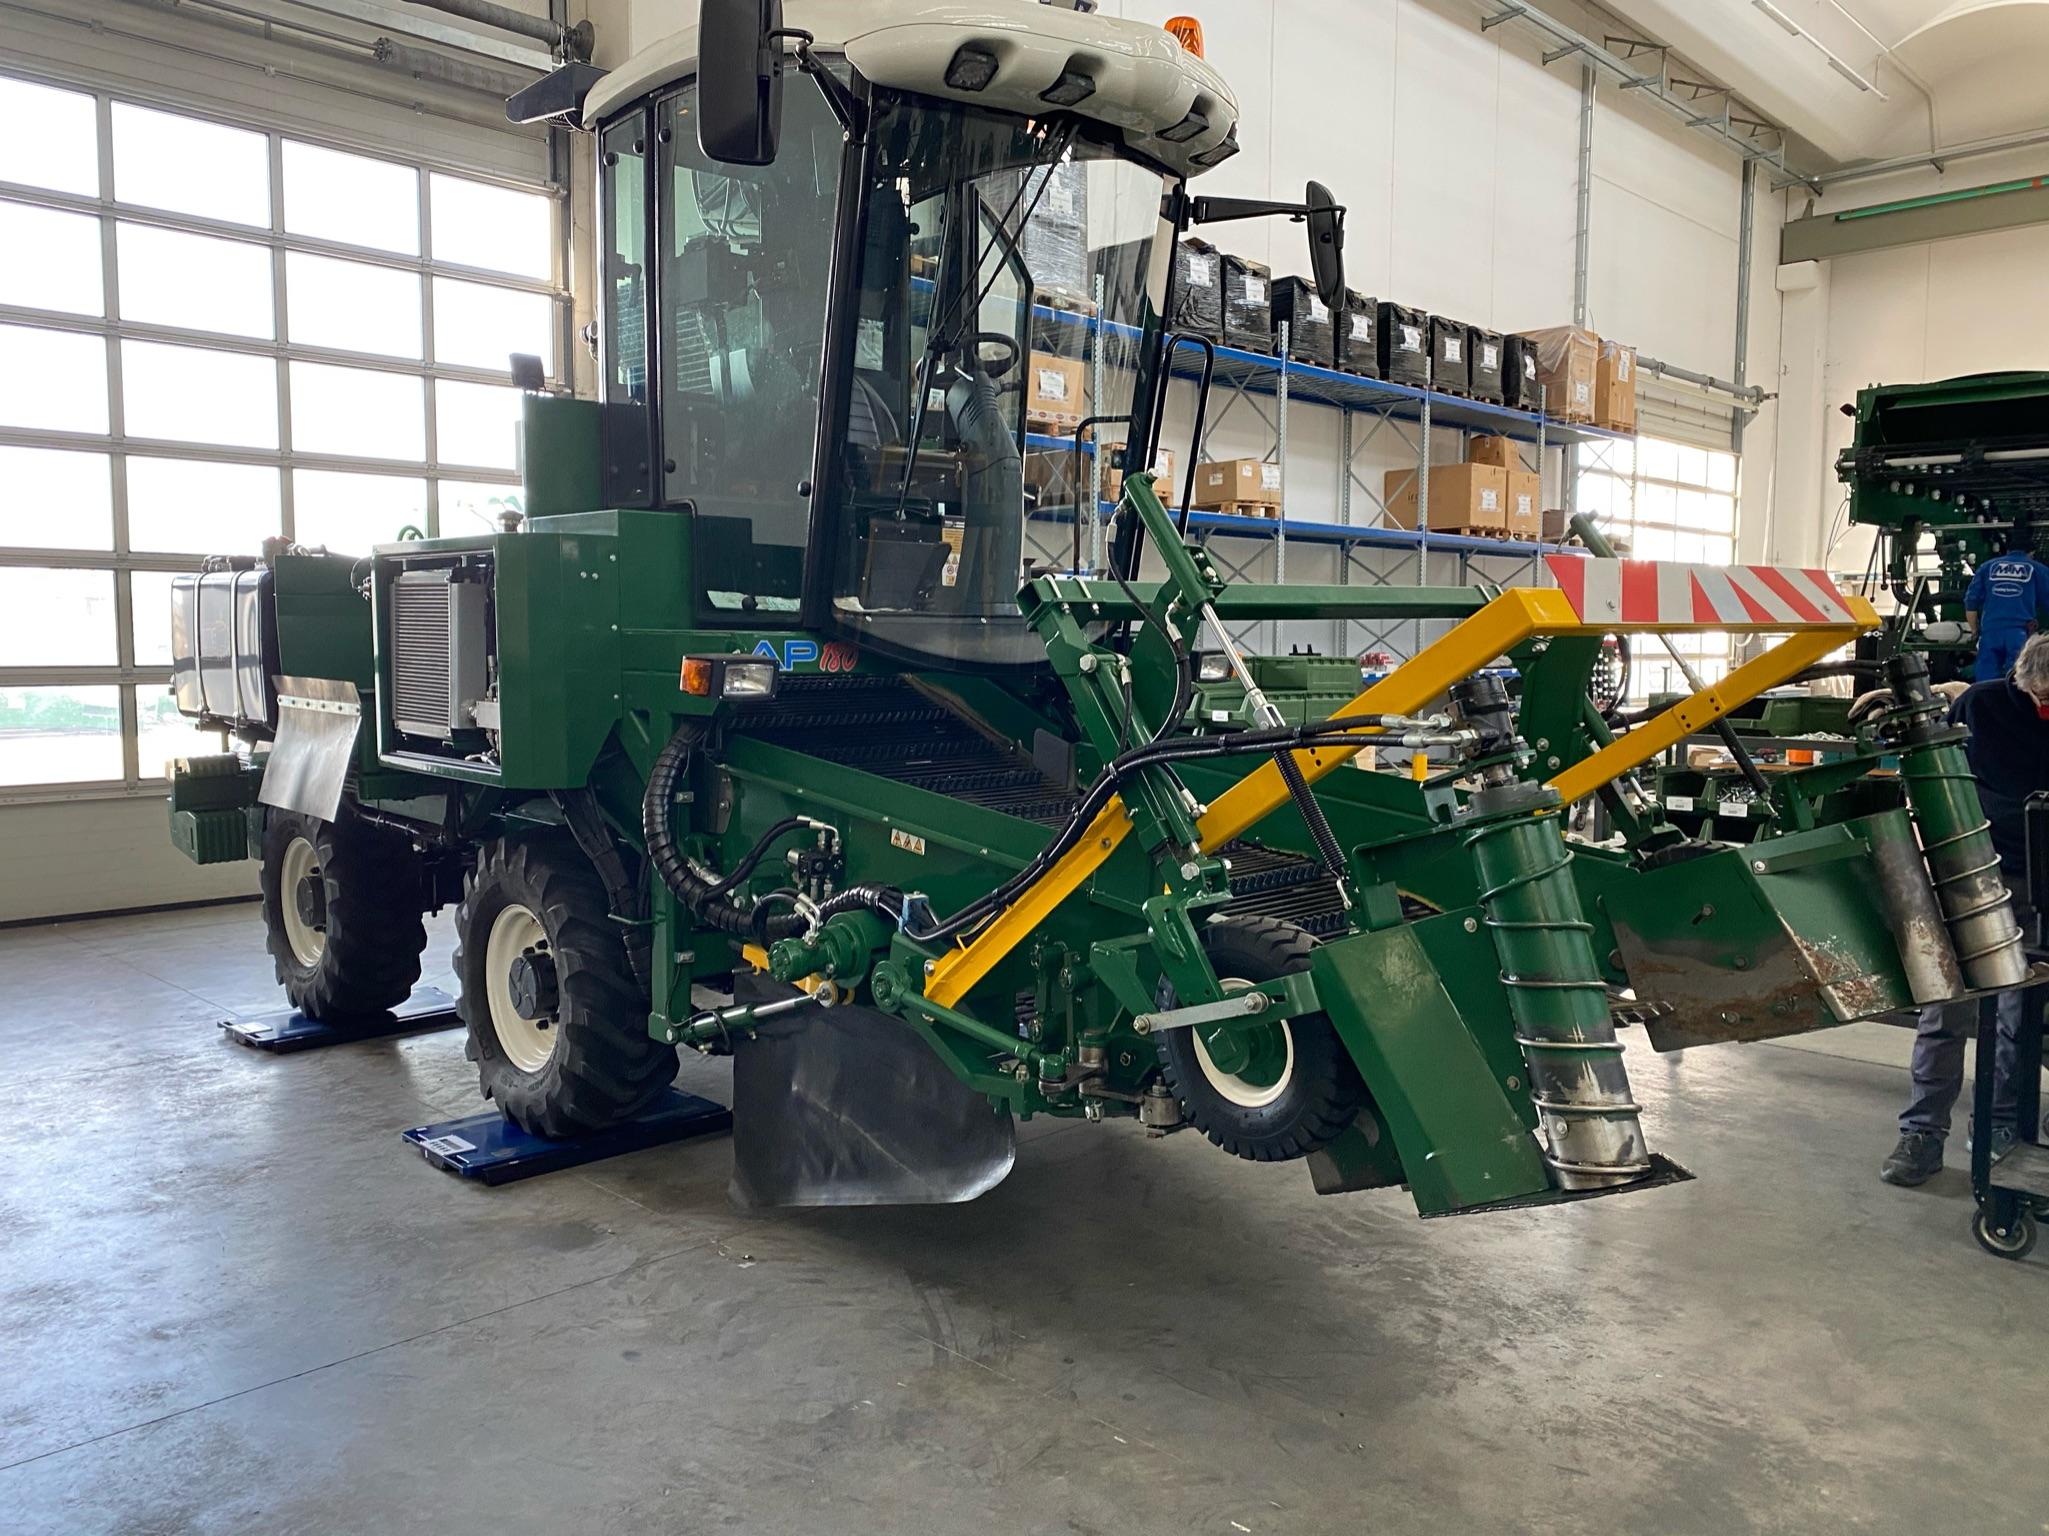 pesatura macchina agricola